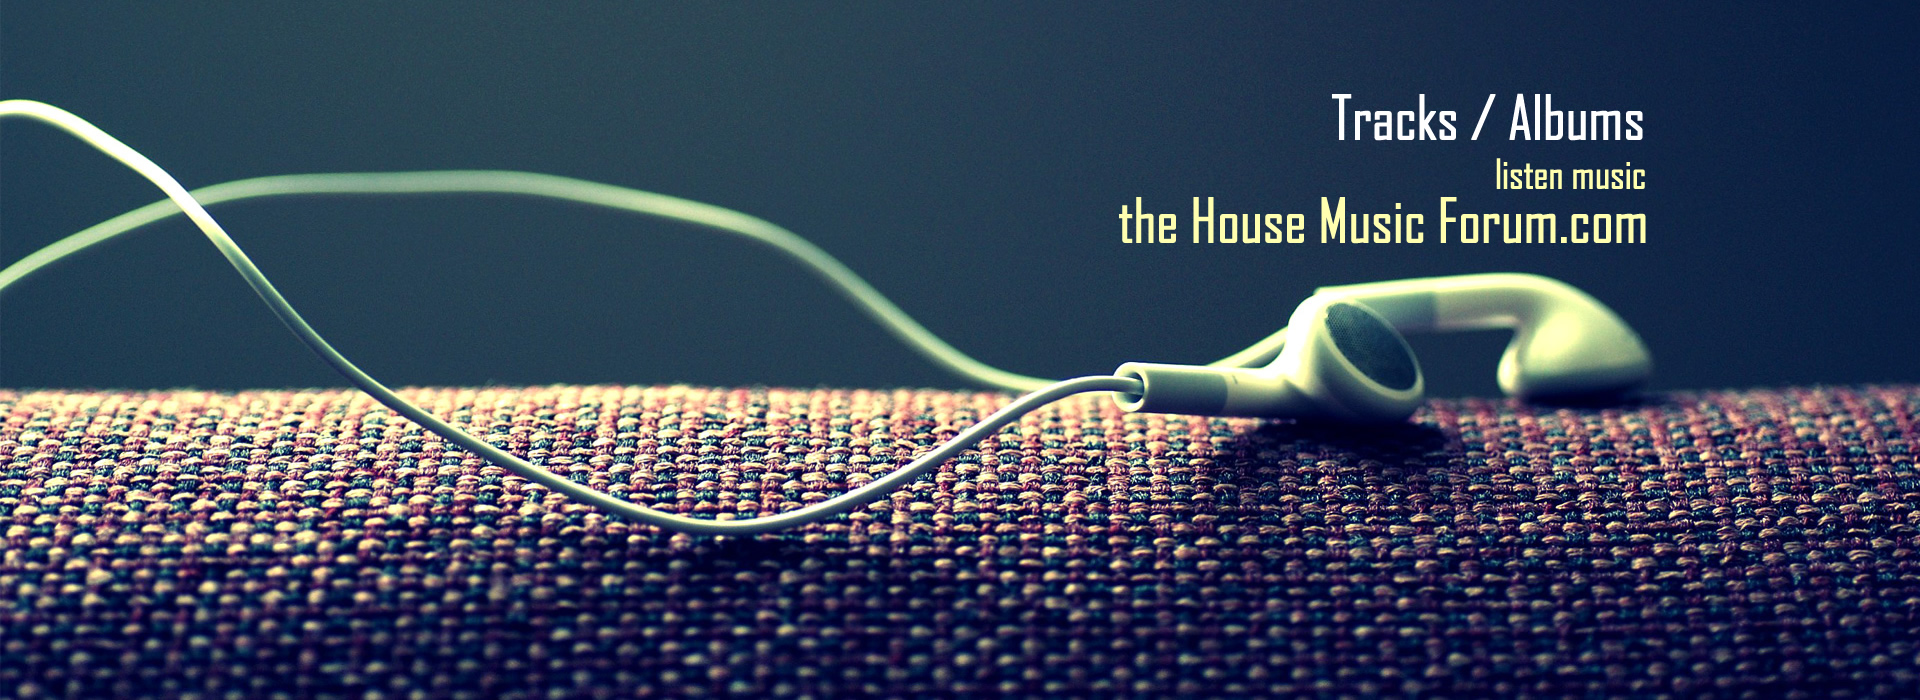 listen music tracks and full albums.